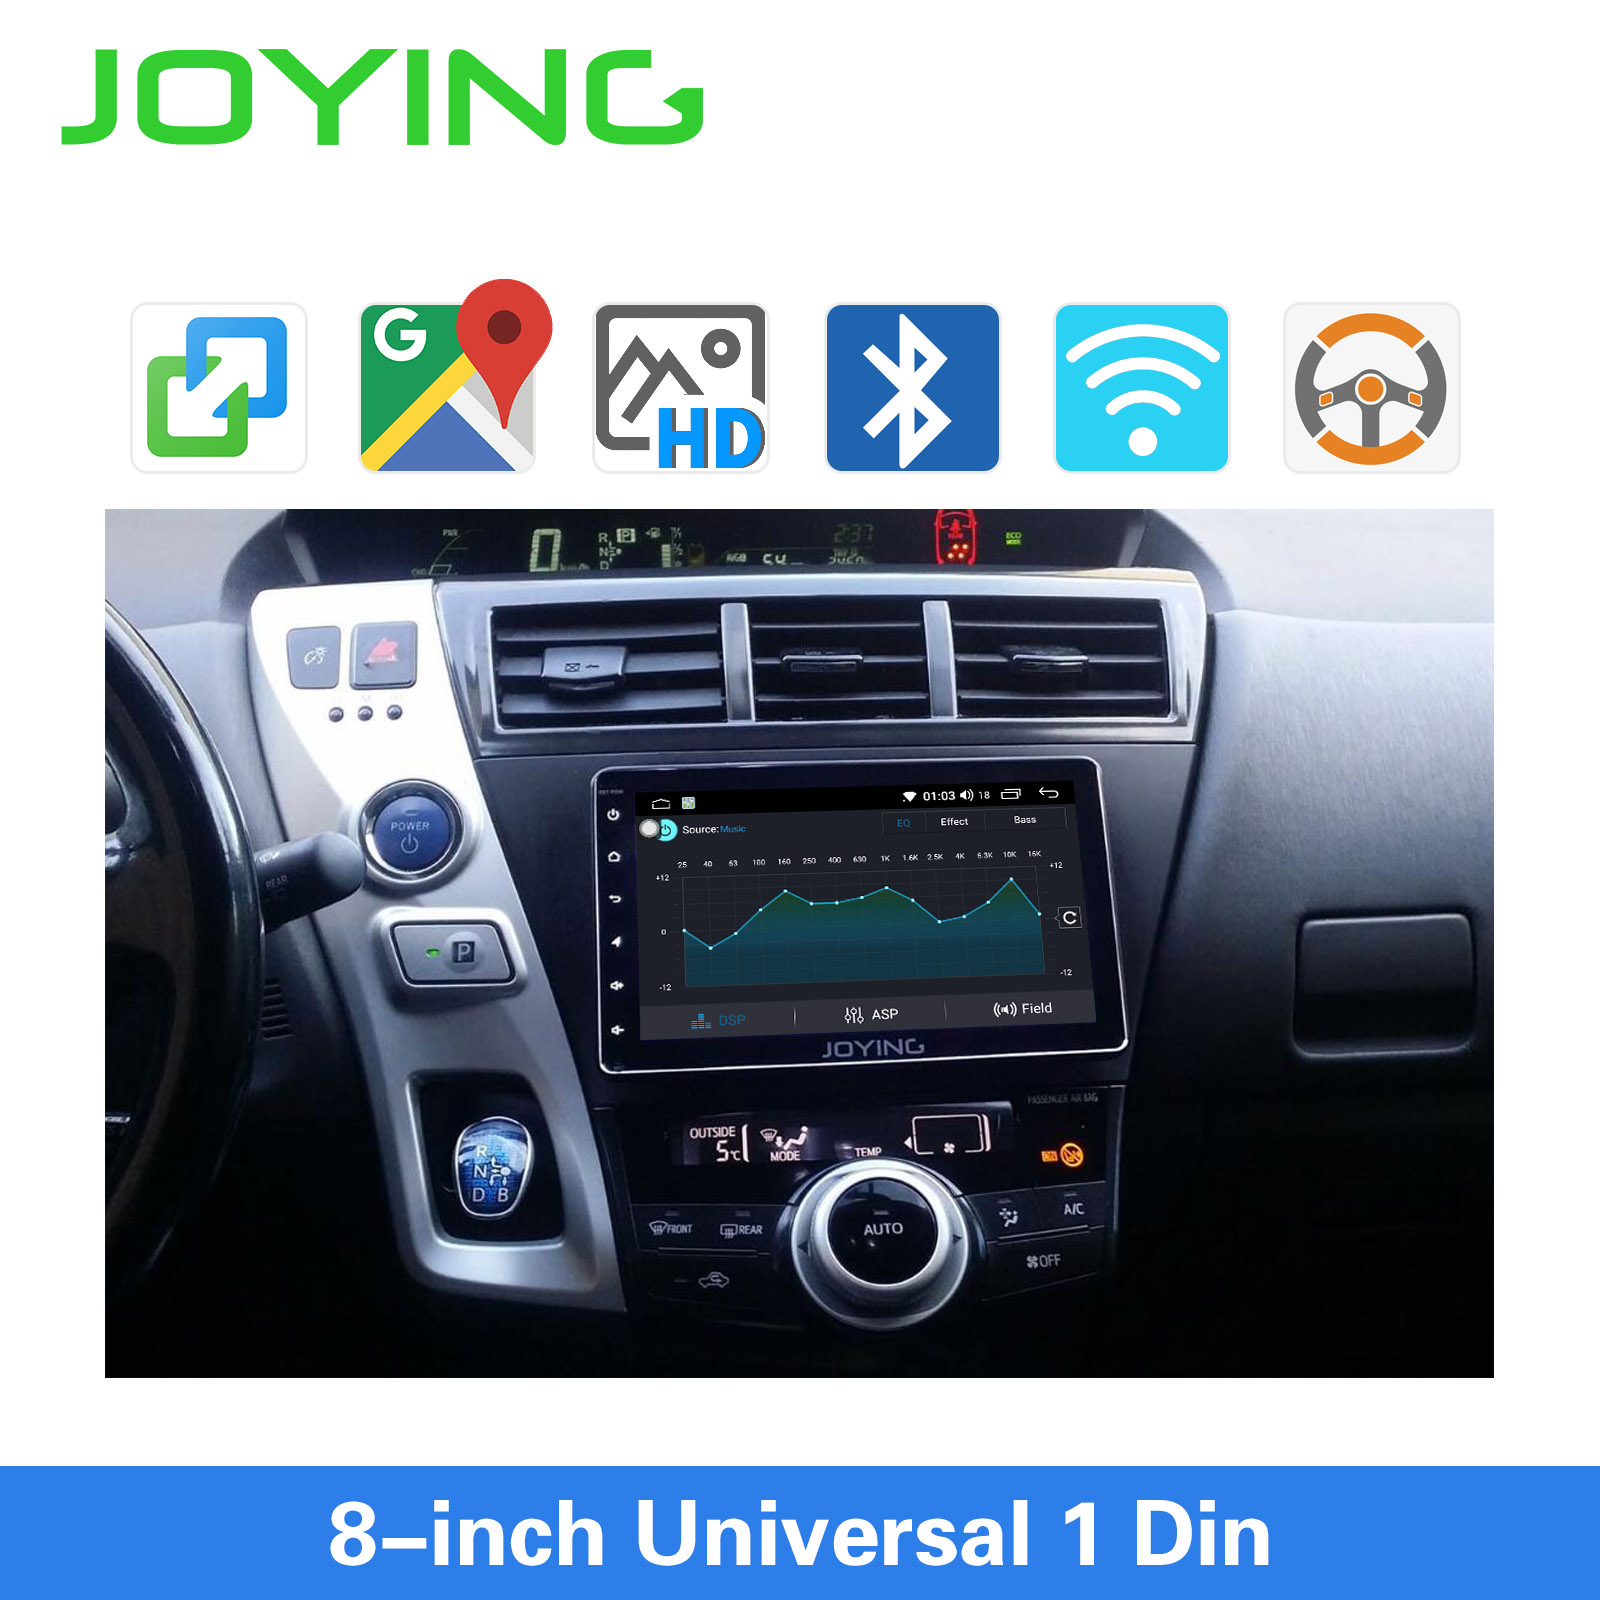 Image 5 - JOYING single din universal car radio 8 inch IPS screen autoradio head unit GPS suport mirror link& fast boot&s*back up cameraCar Multimedia Player   -